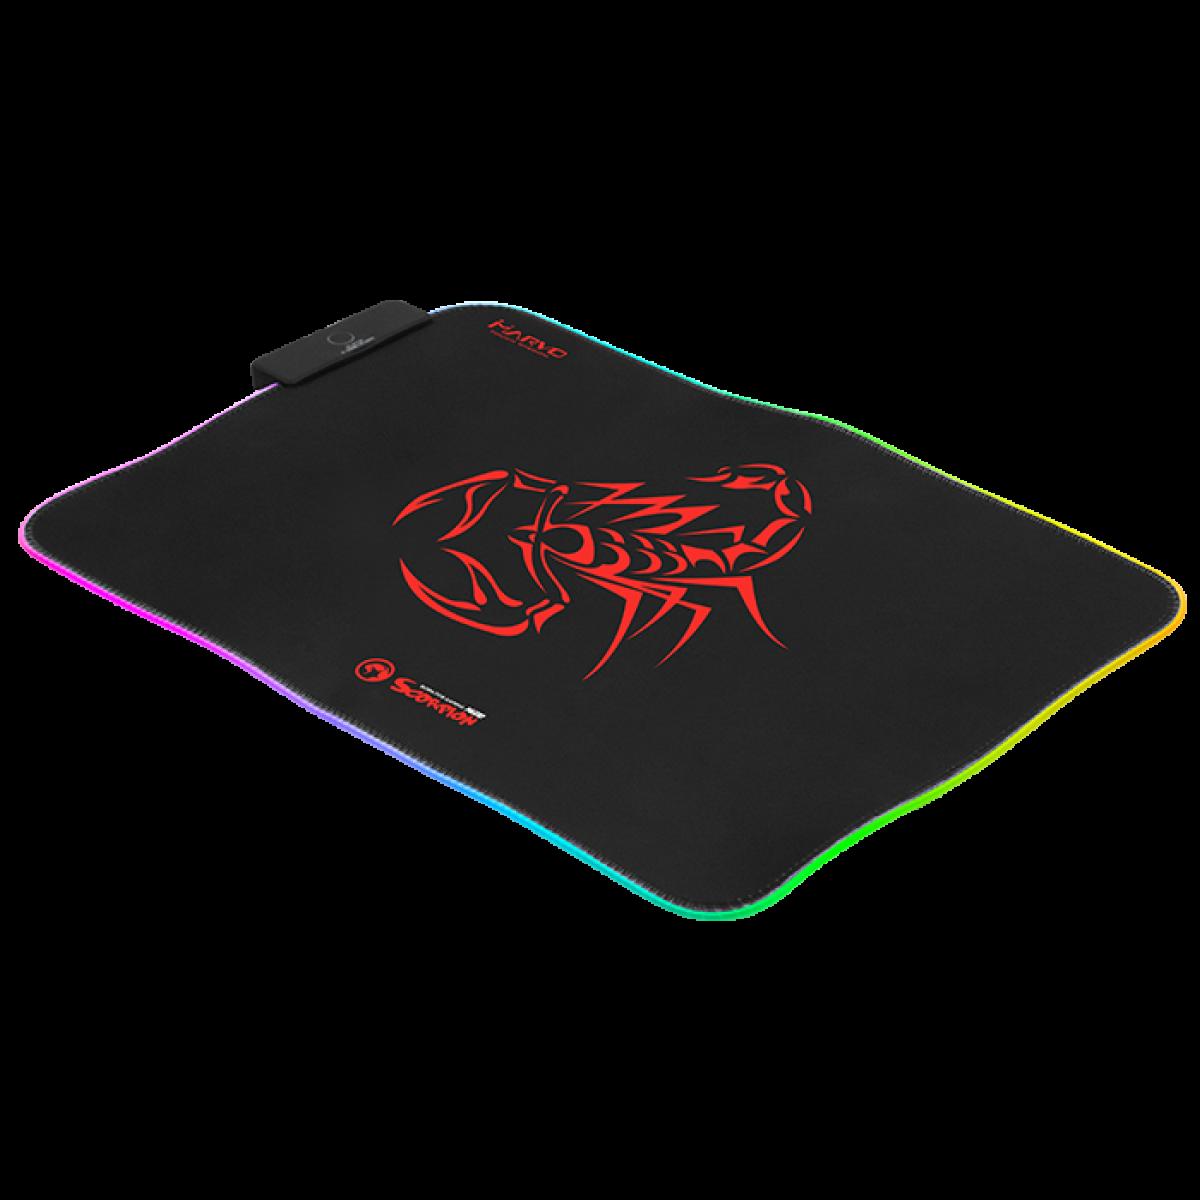 Mousepad Marvo Gamer Scorpion, Speed, Grande, RGB 7 Cores, MG08